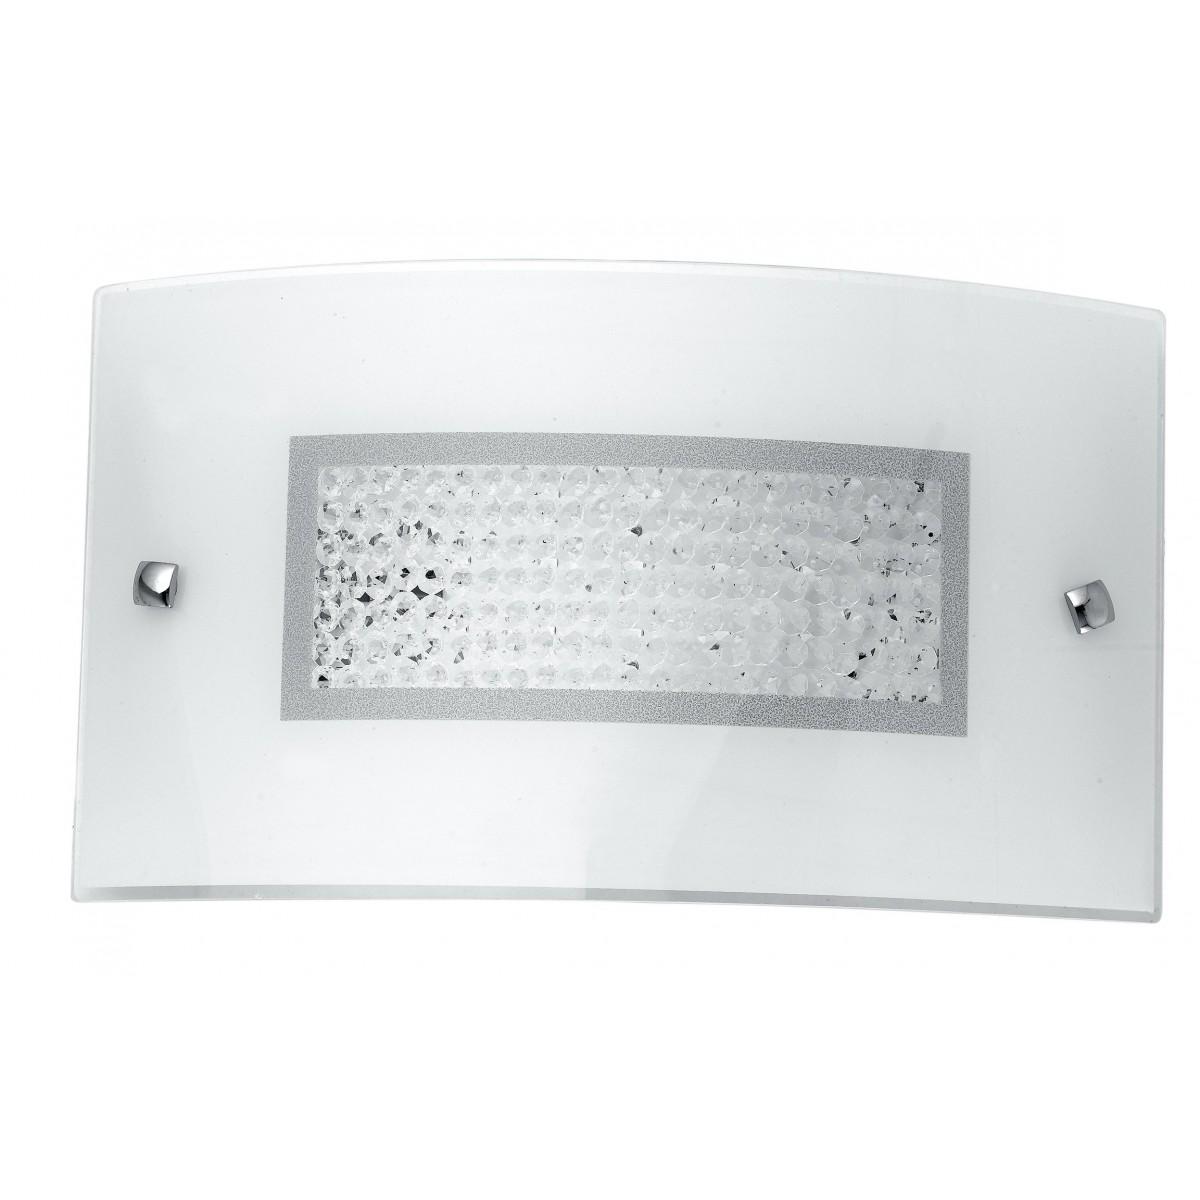 I-TRILOGY/AP3520 - Applique Classica Rettangolare Vetro decoro Cristalli K9 Led 16 watt Luce Naturale